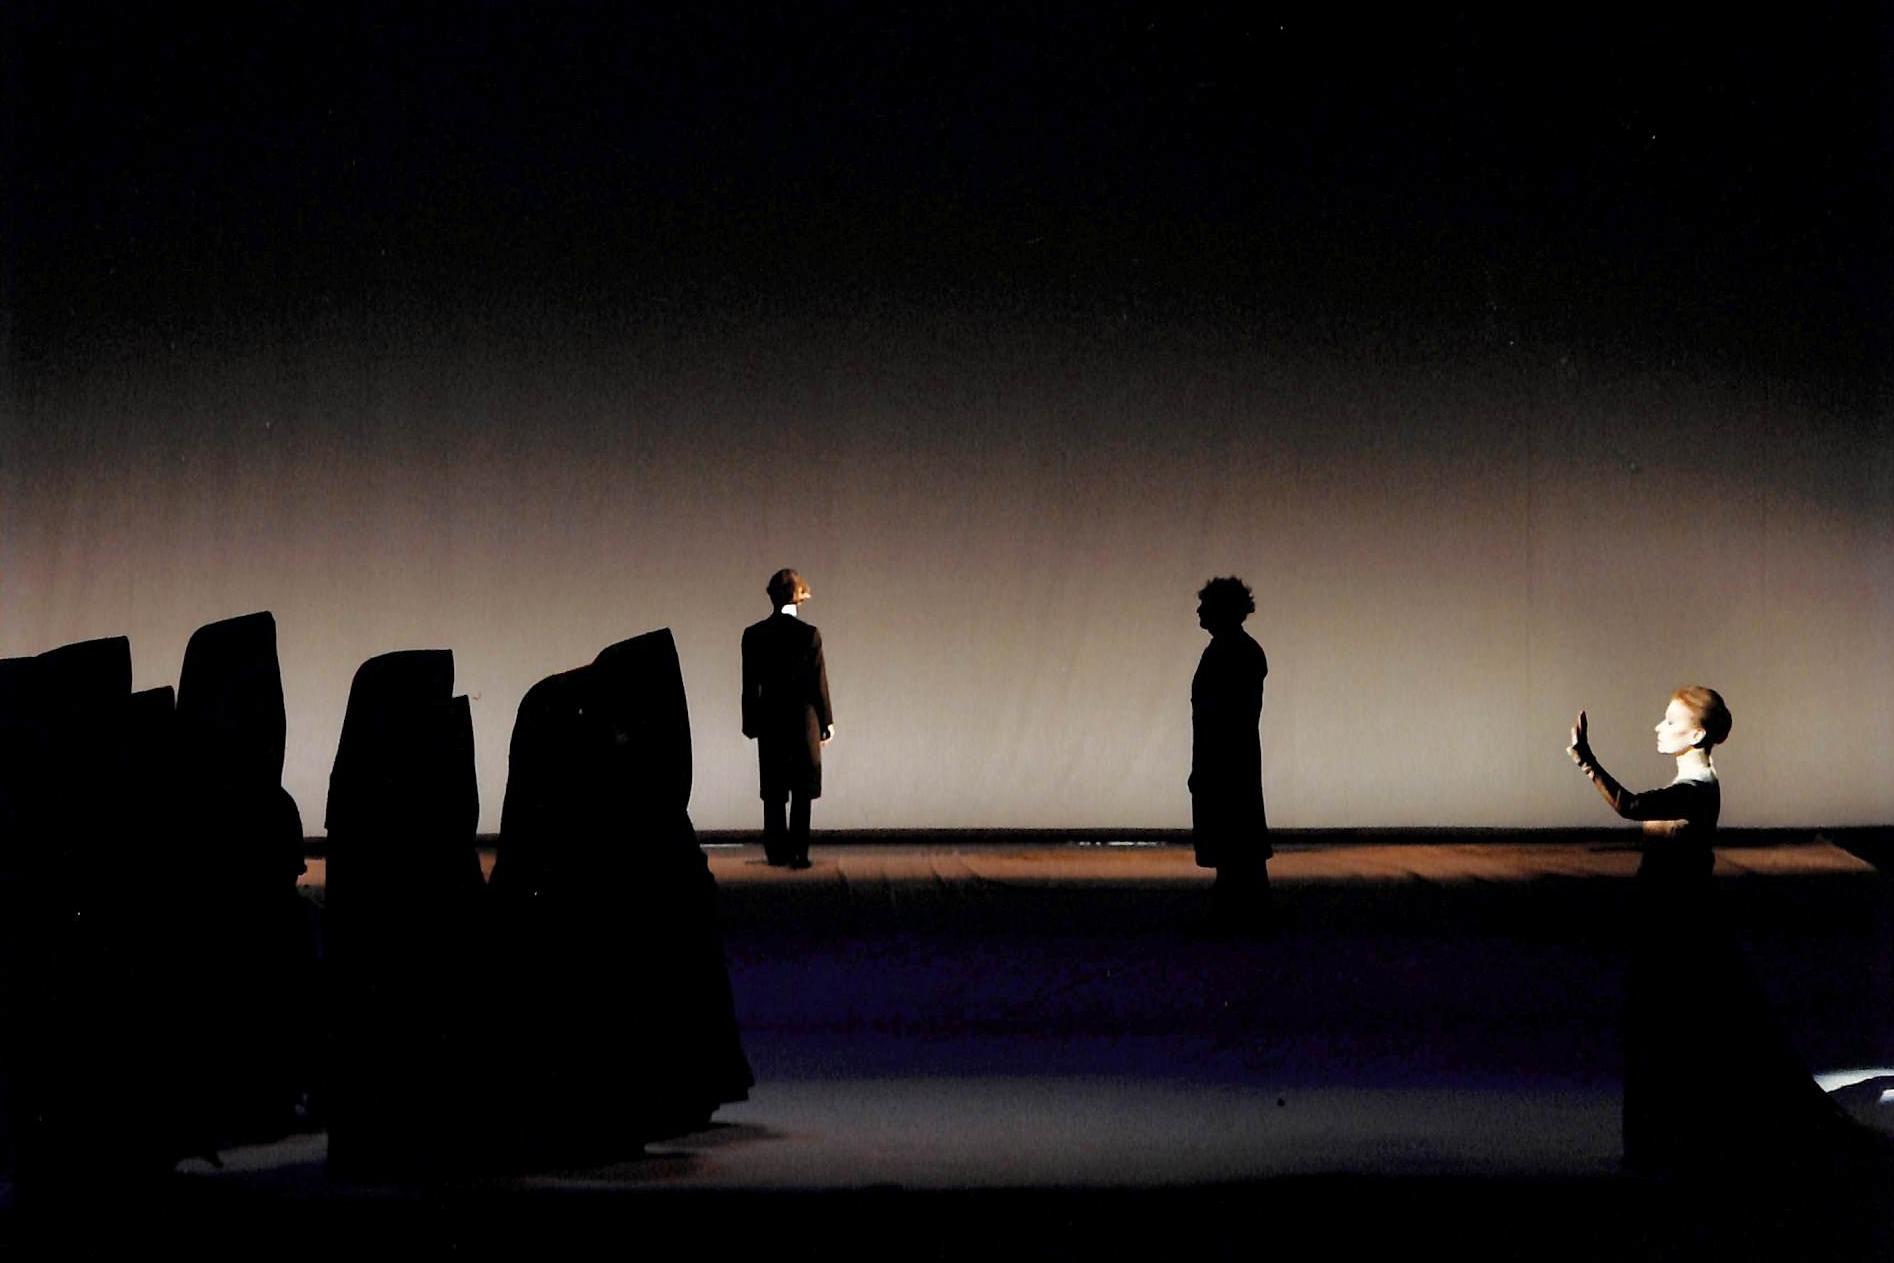 Act VII - Ensemble (Crowd), Martin Wuttke (Gilgamesh), Howie Seago (Enkidu), Eva-Maria Meineke (Mother of Gilgamesh)